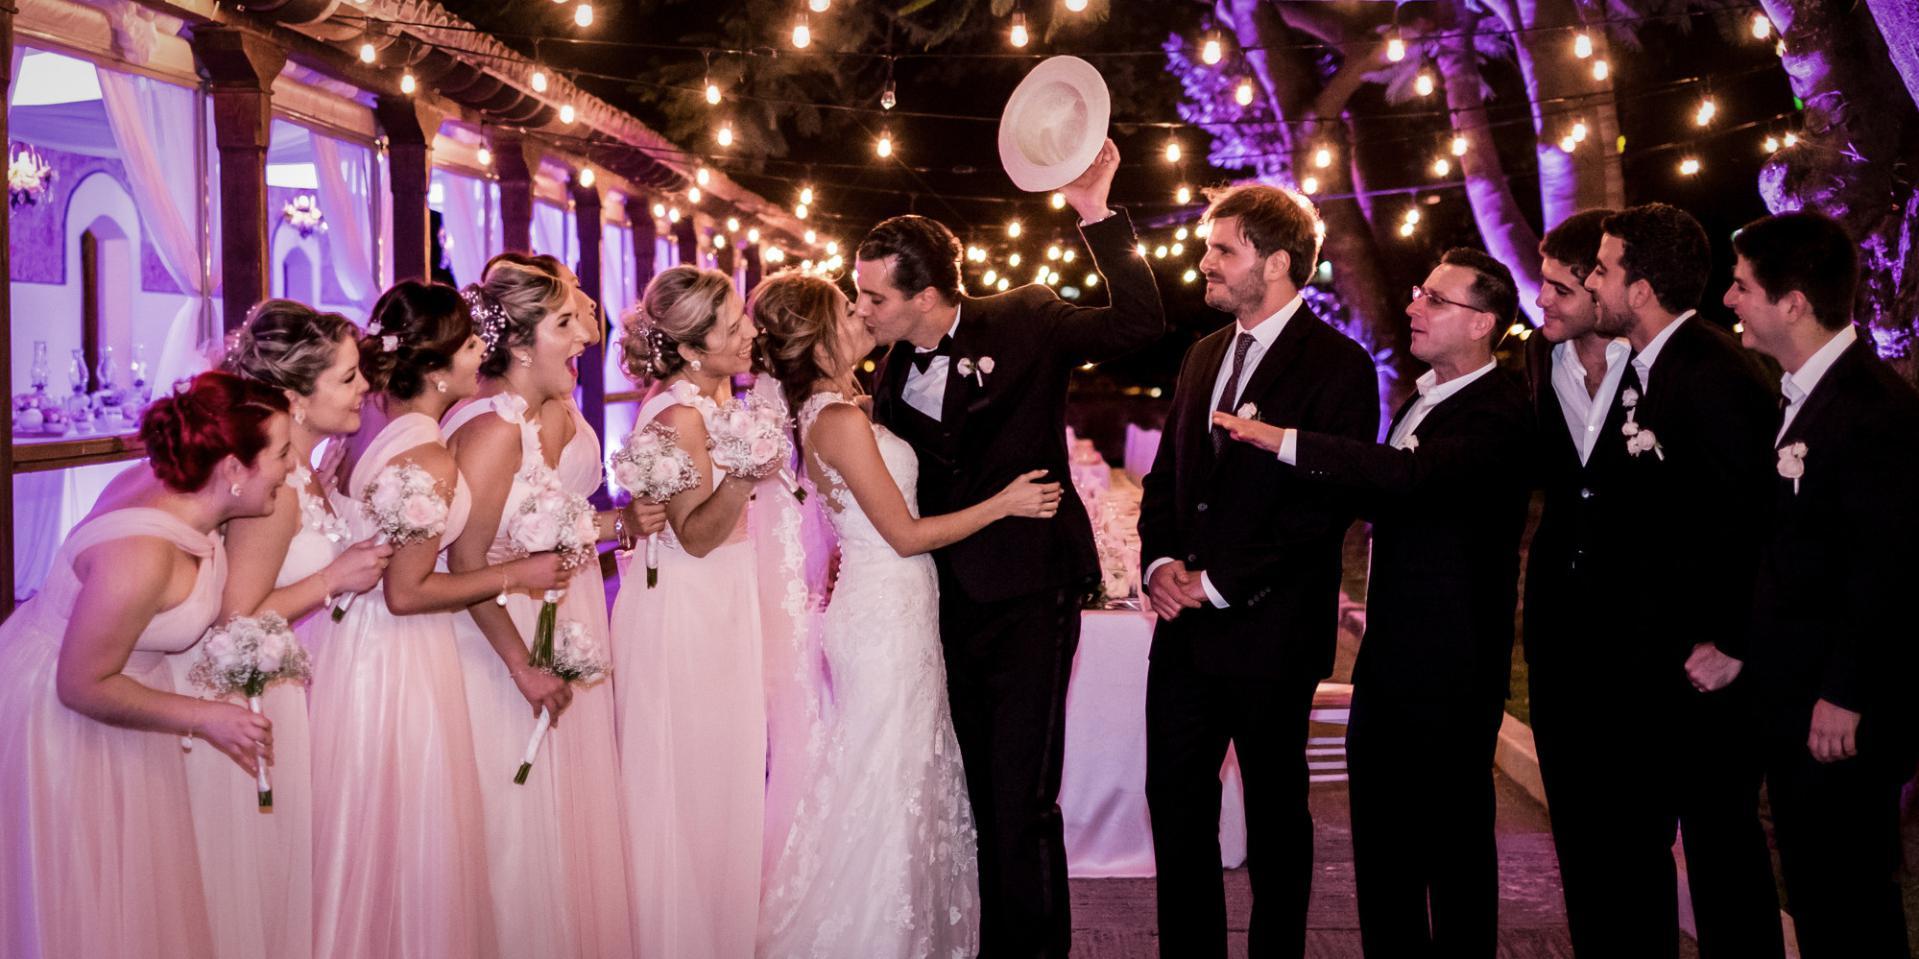 bodas-sin-clasificar-sin-tema-cuba-27821.jpg